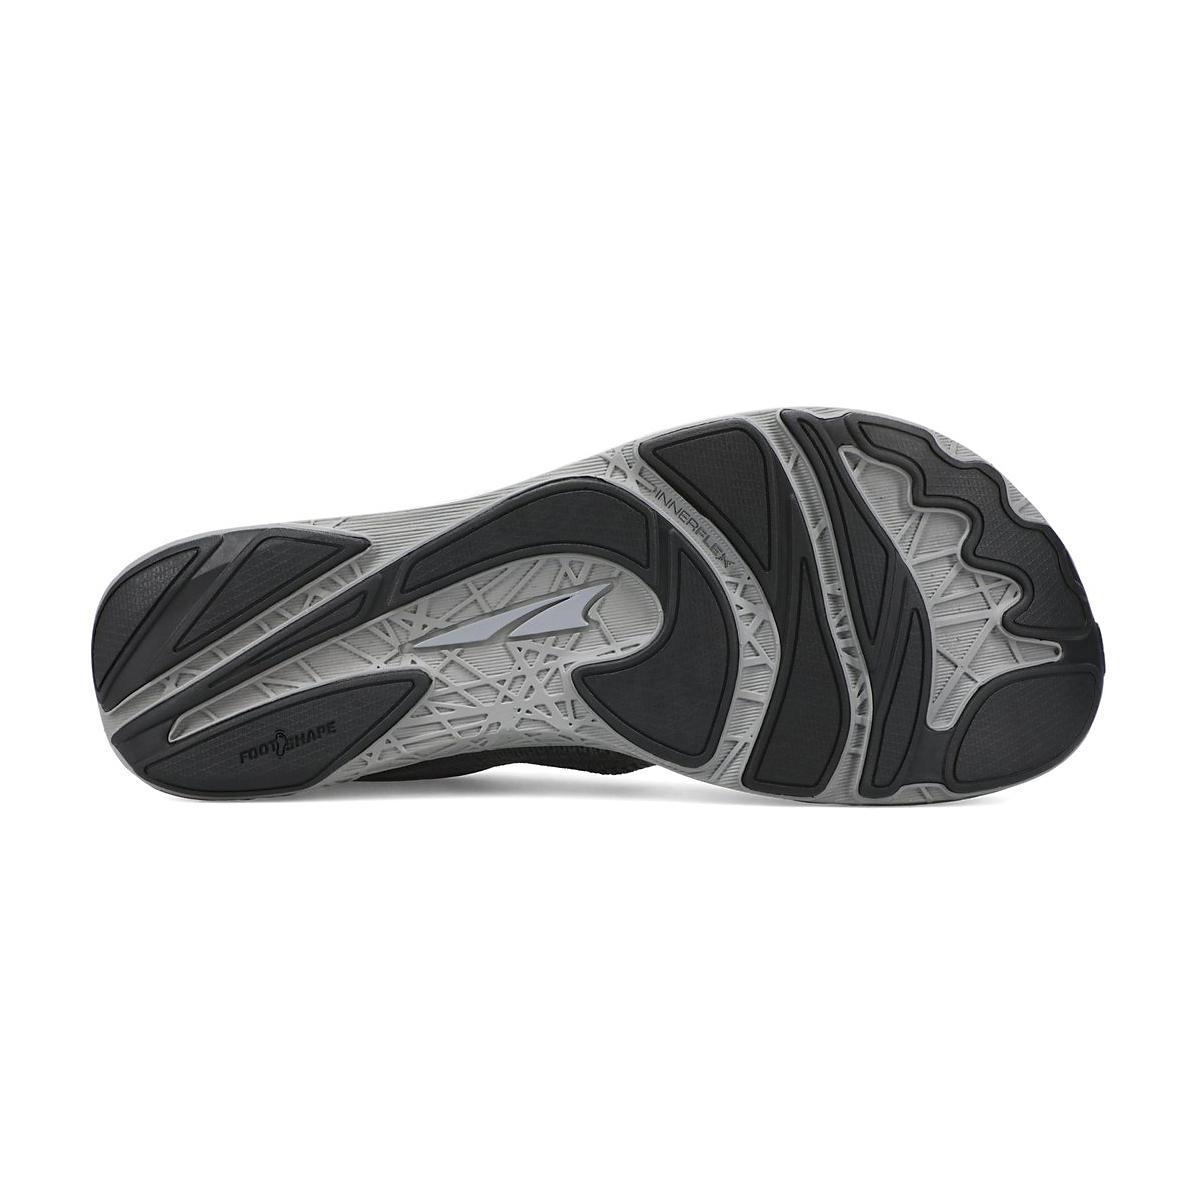 Men's Altra Escalante 2.5 Running Shoe - Color: Gray - Size: 7 - Width: Regular, Gray, large, image 4